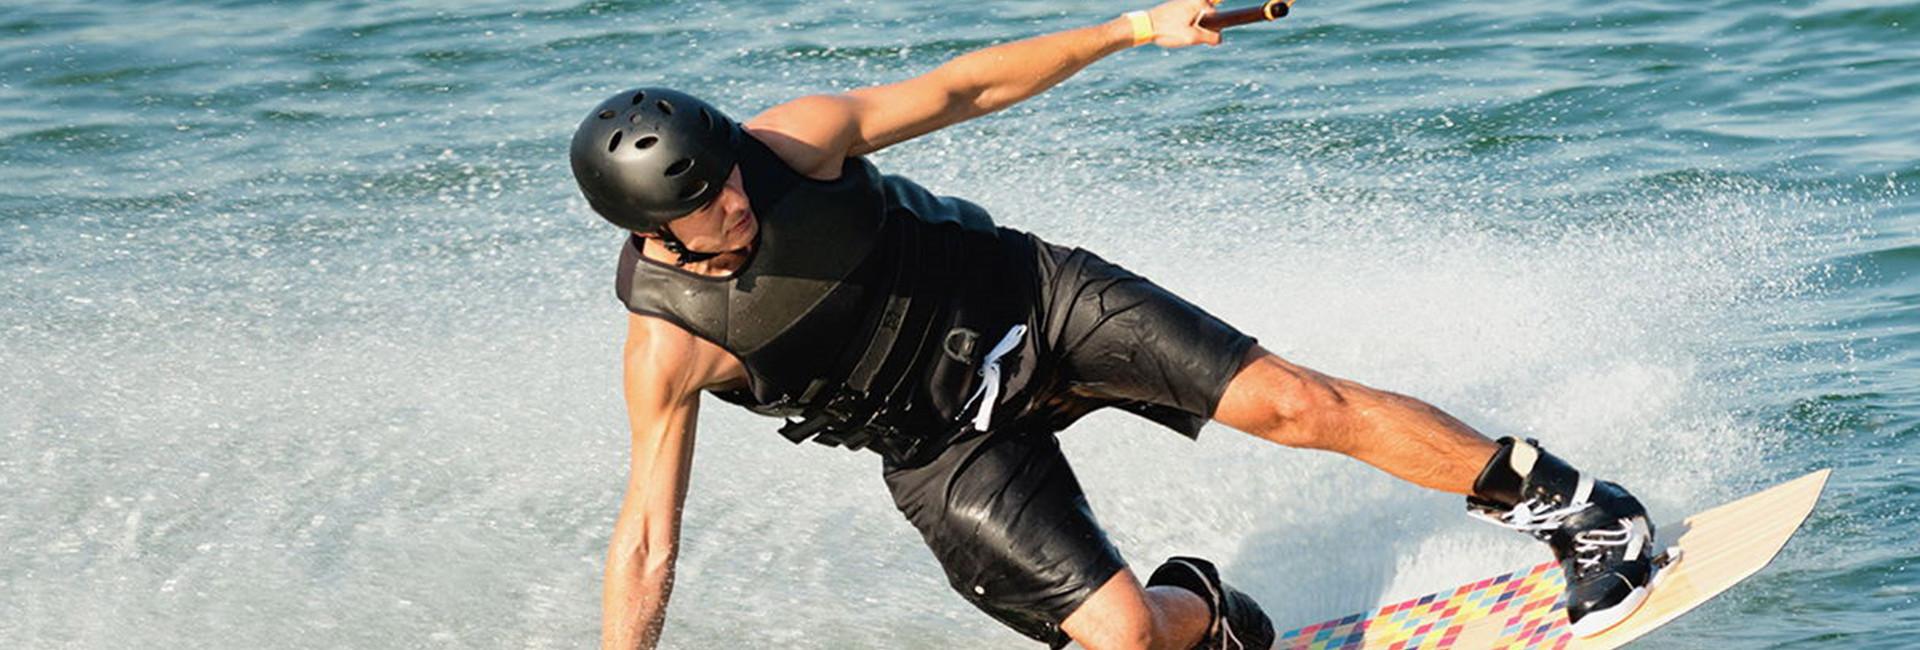 Dude in black wetsuit wakeboarding